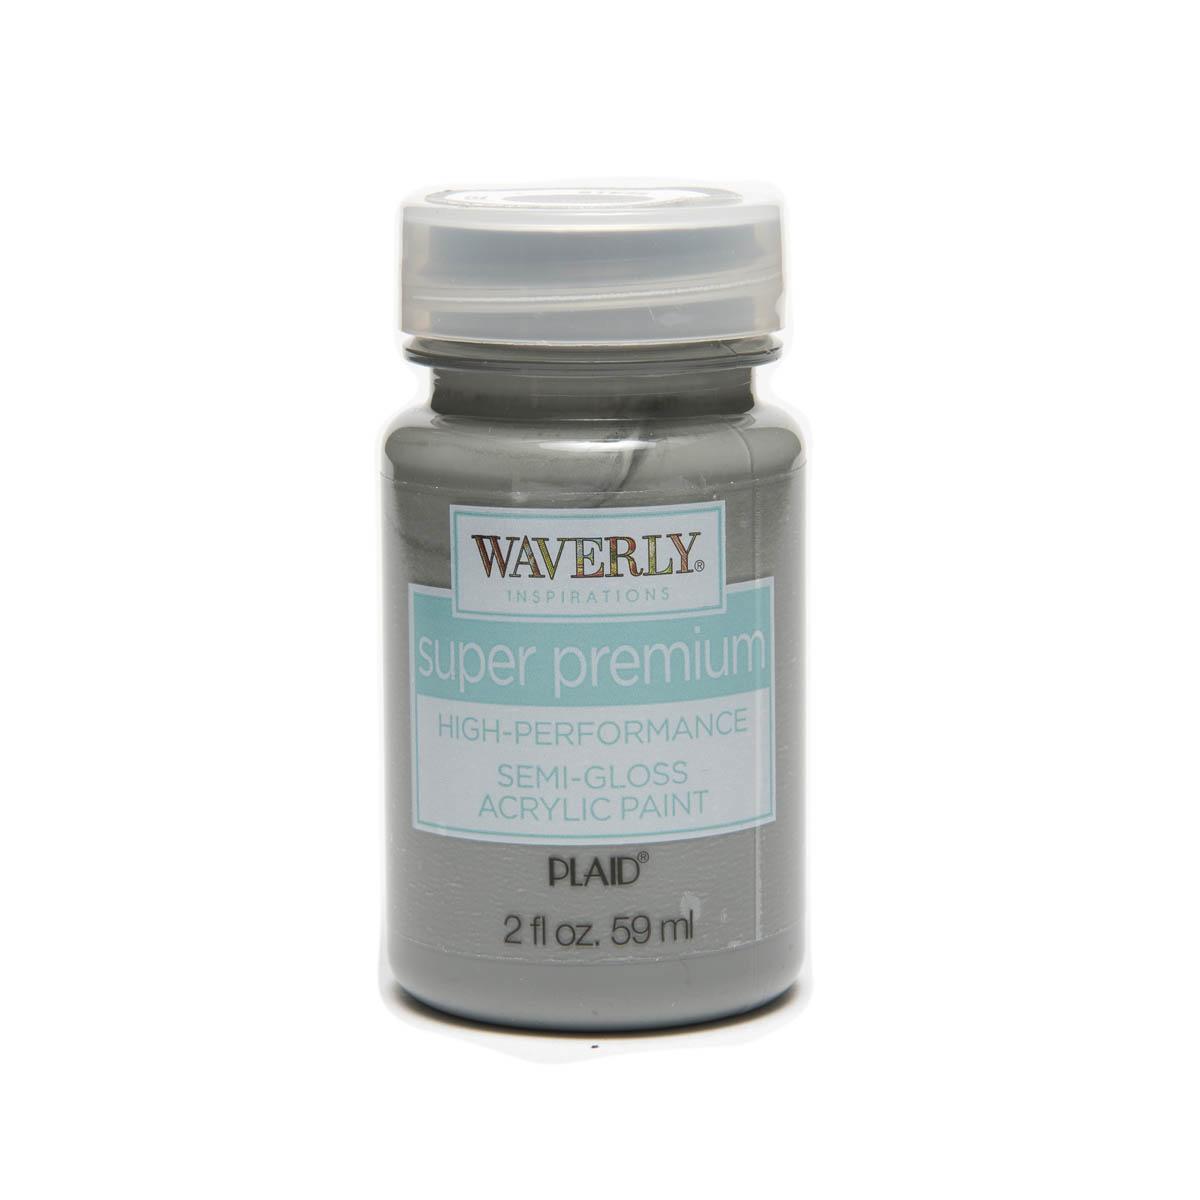 Waverly ® Inspirations Super Premium Semi-Gloss Acrylic Paint - Steel, 2 oz. - 60654E